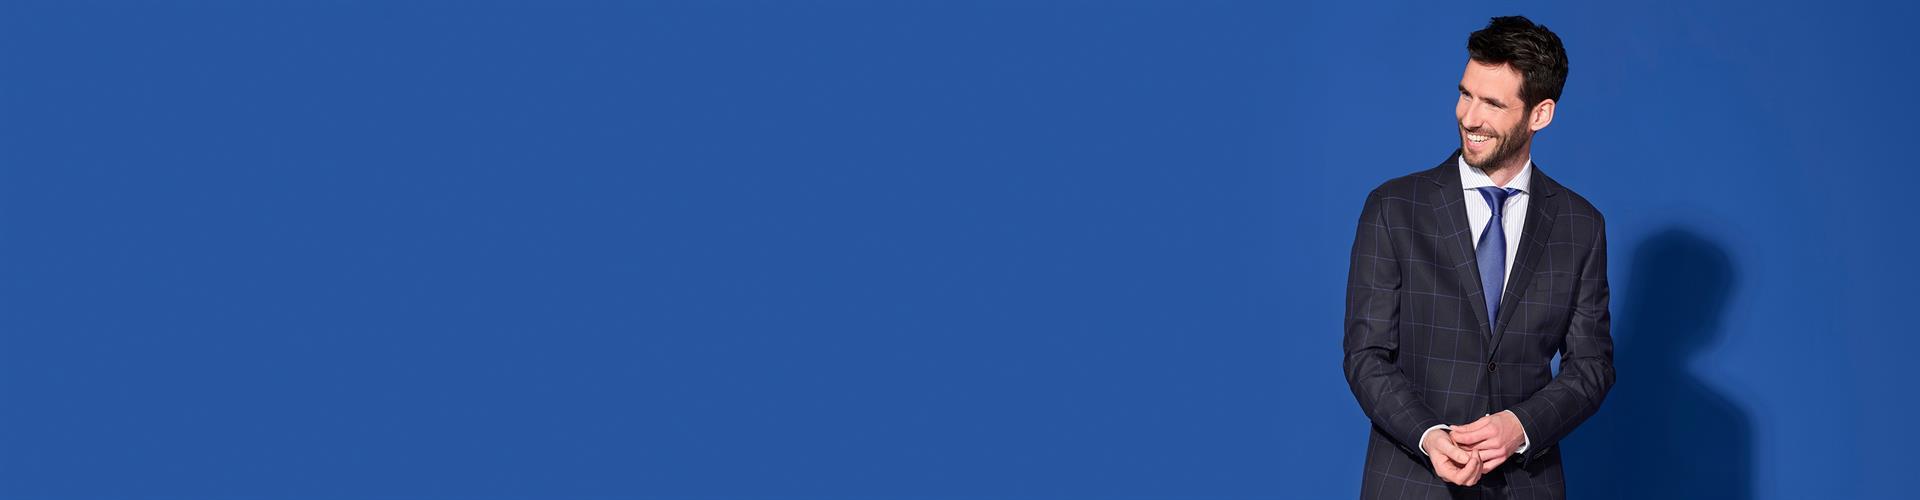 02-06-OnzeService-Kostuums-BannerTop-3840x1000